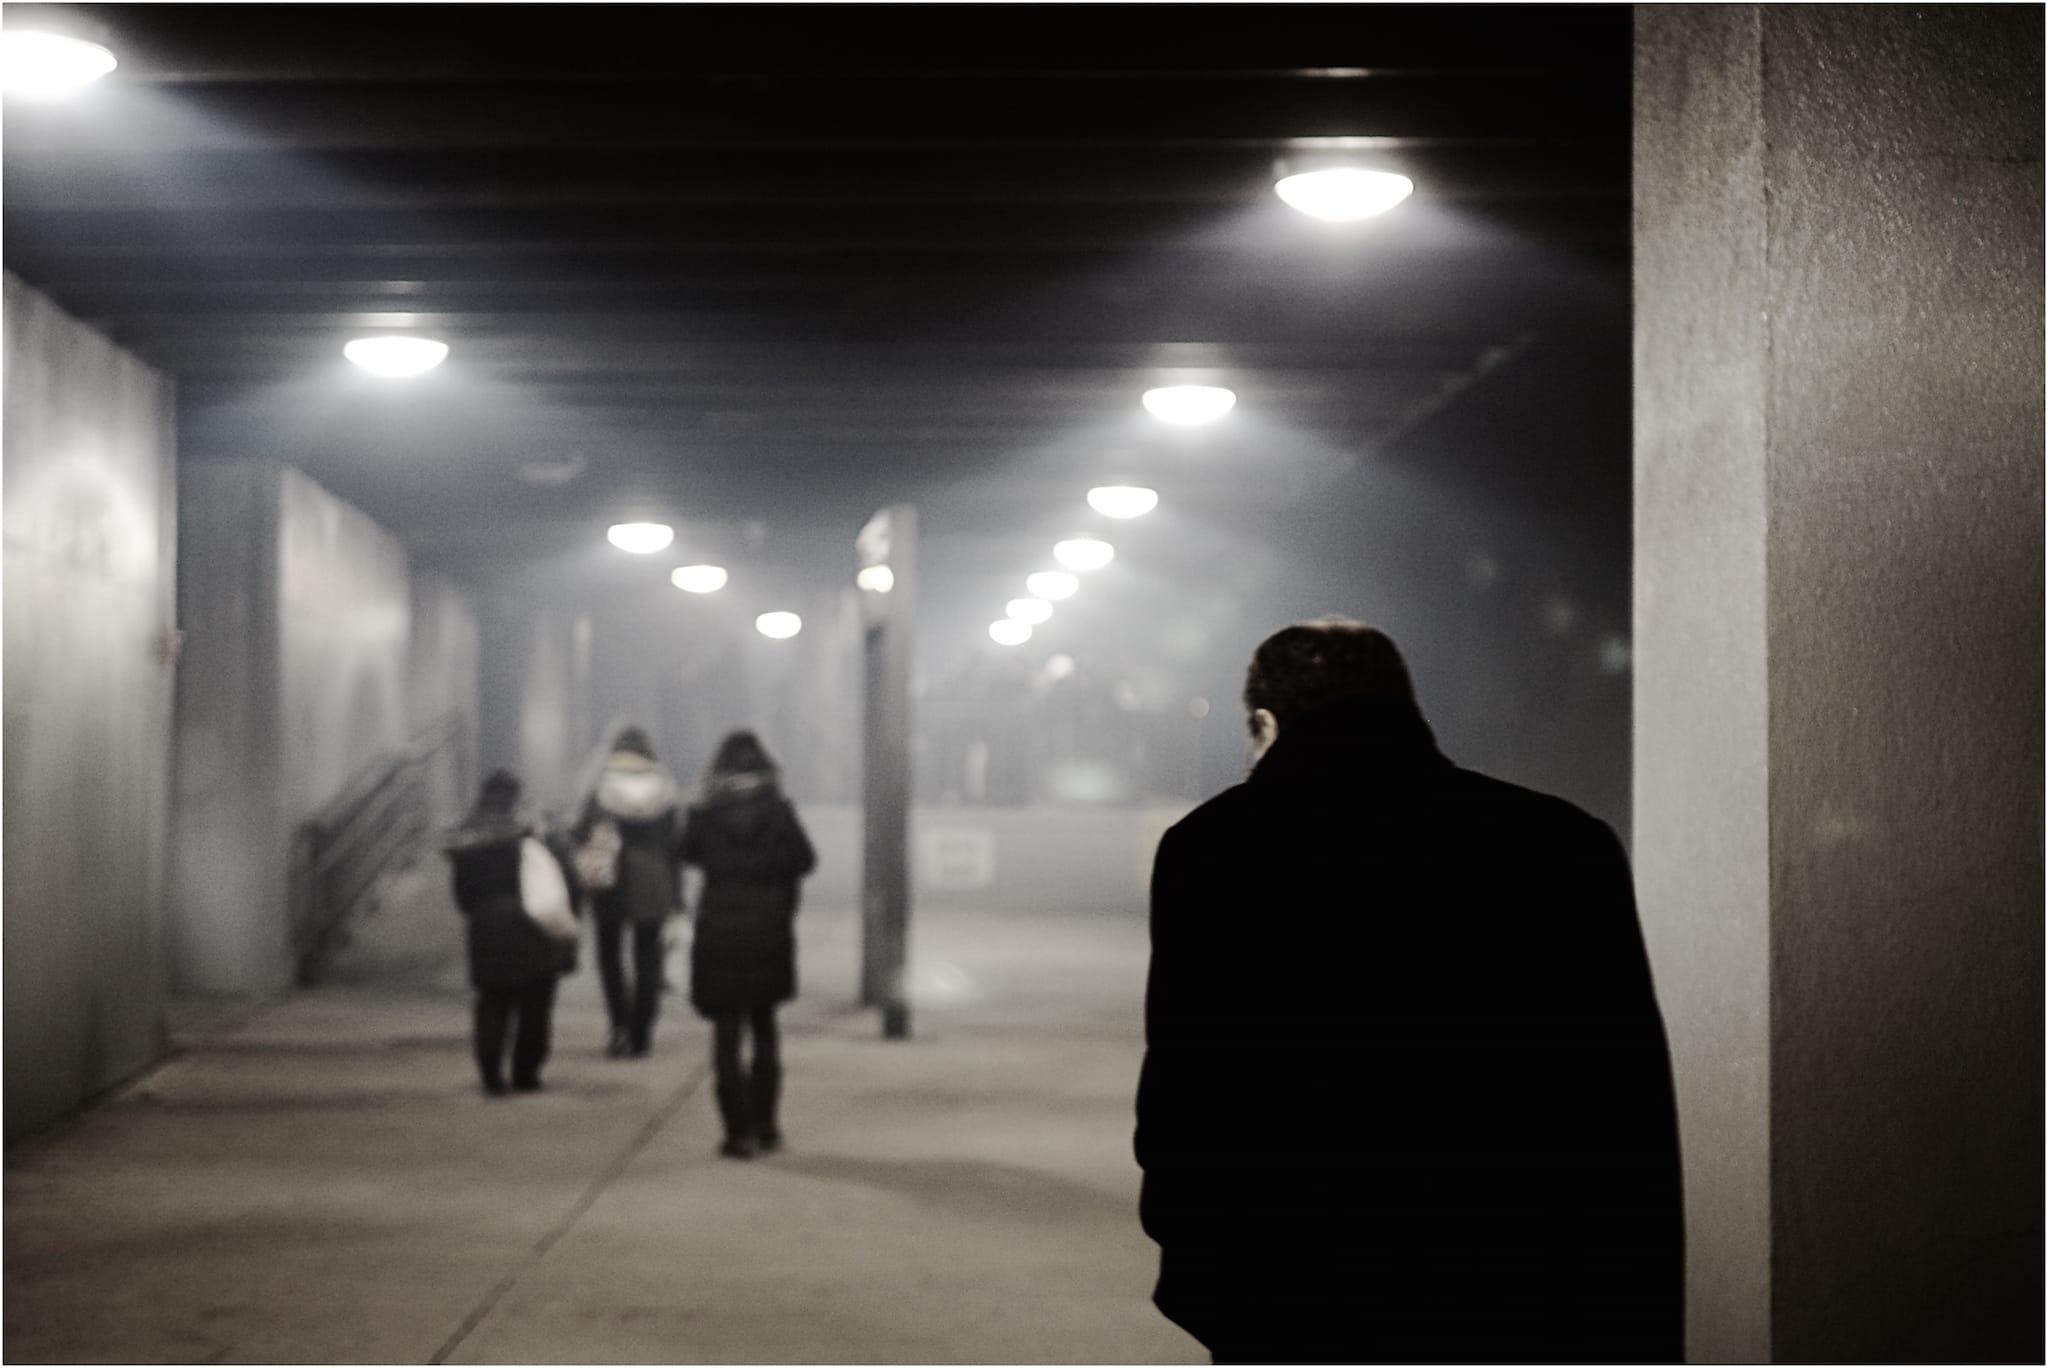 """Kafka?"" by Philip Salgannik. Shot in Back Bay Rail Station, Boston, MA, USA, November, 2014"